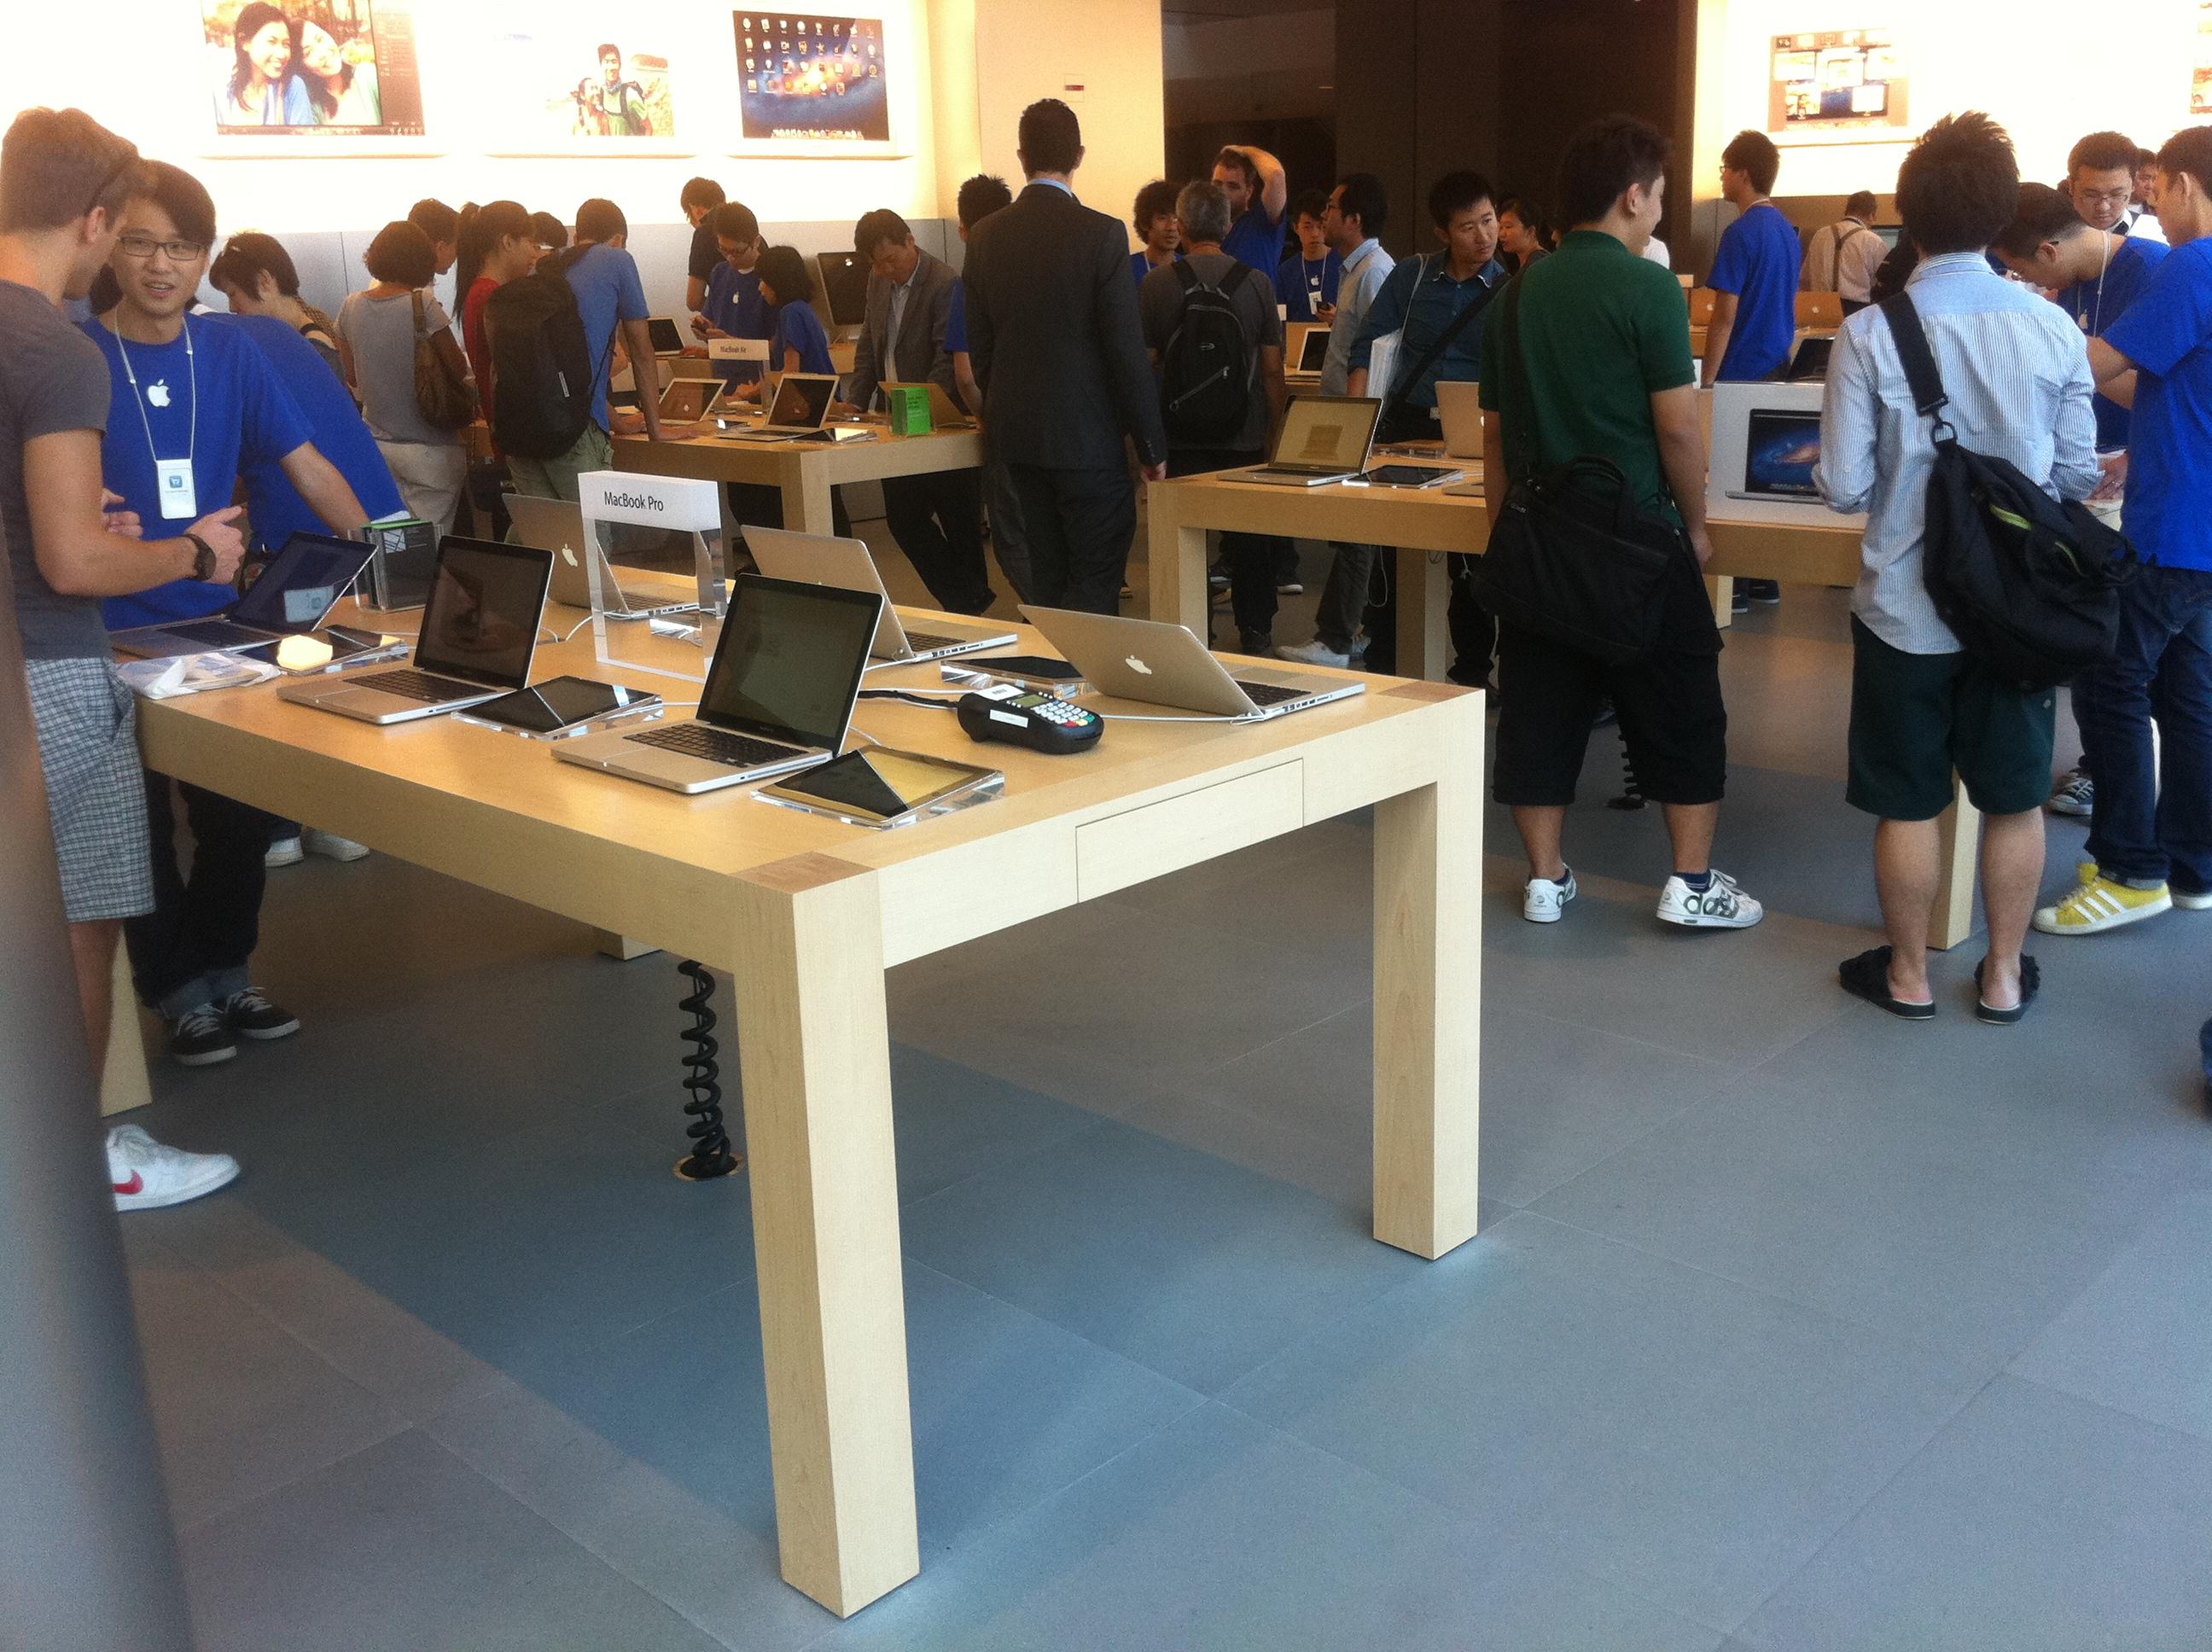 File:HK 中環 Central IFC Mall 蘋果店 Apple Shop Interior Table Visitors Oct